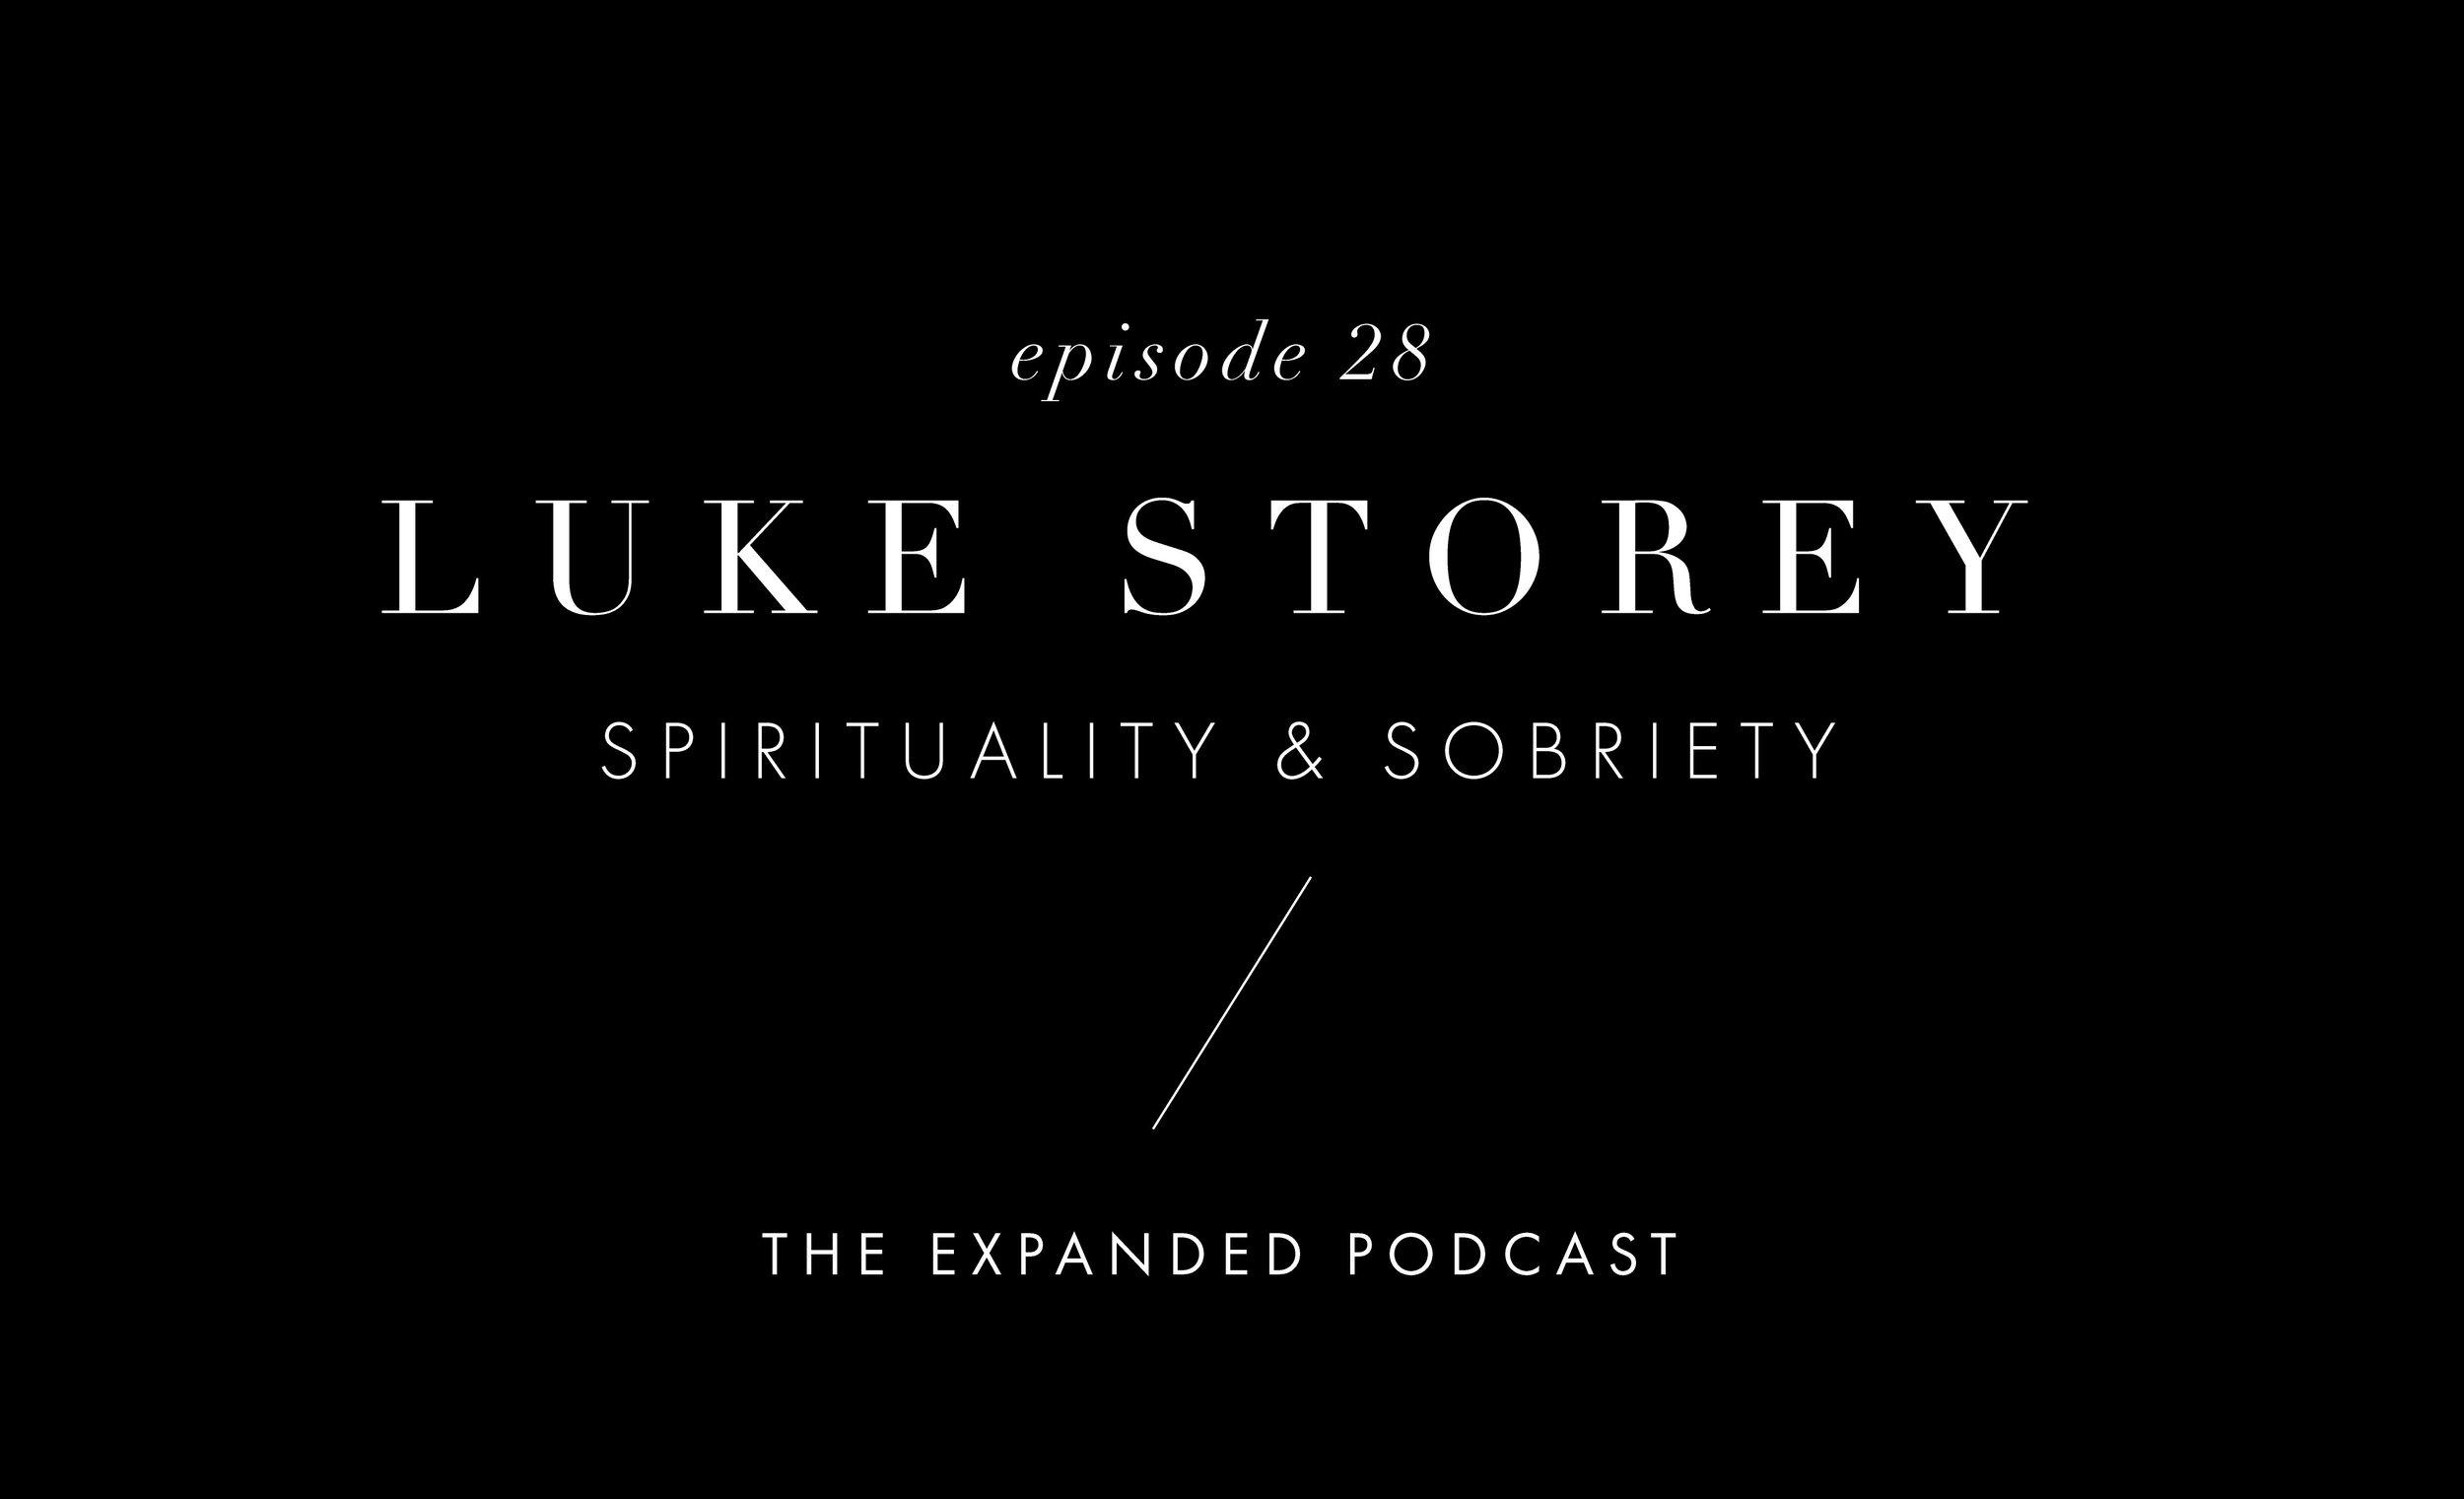 Spirituality and Sobriety